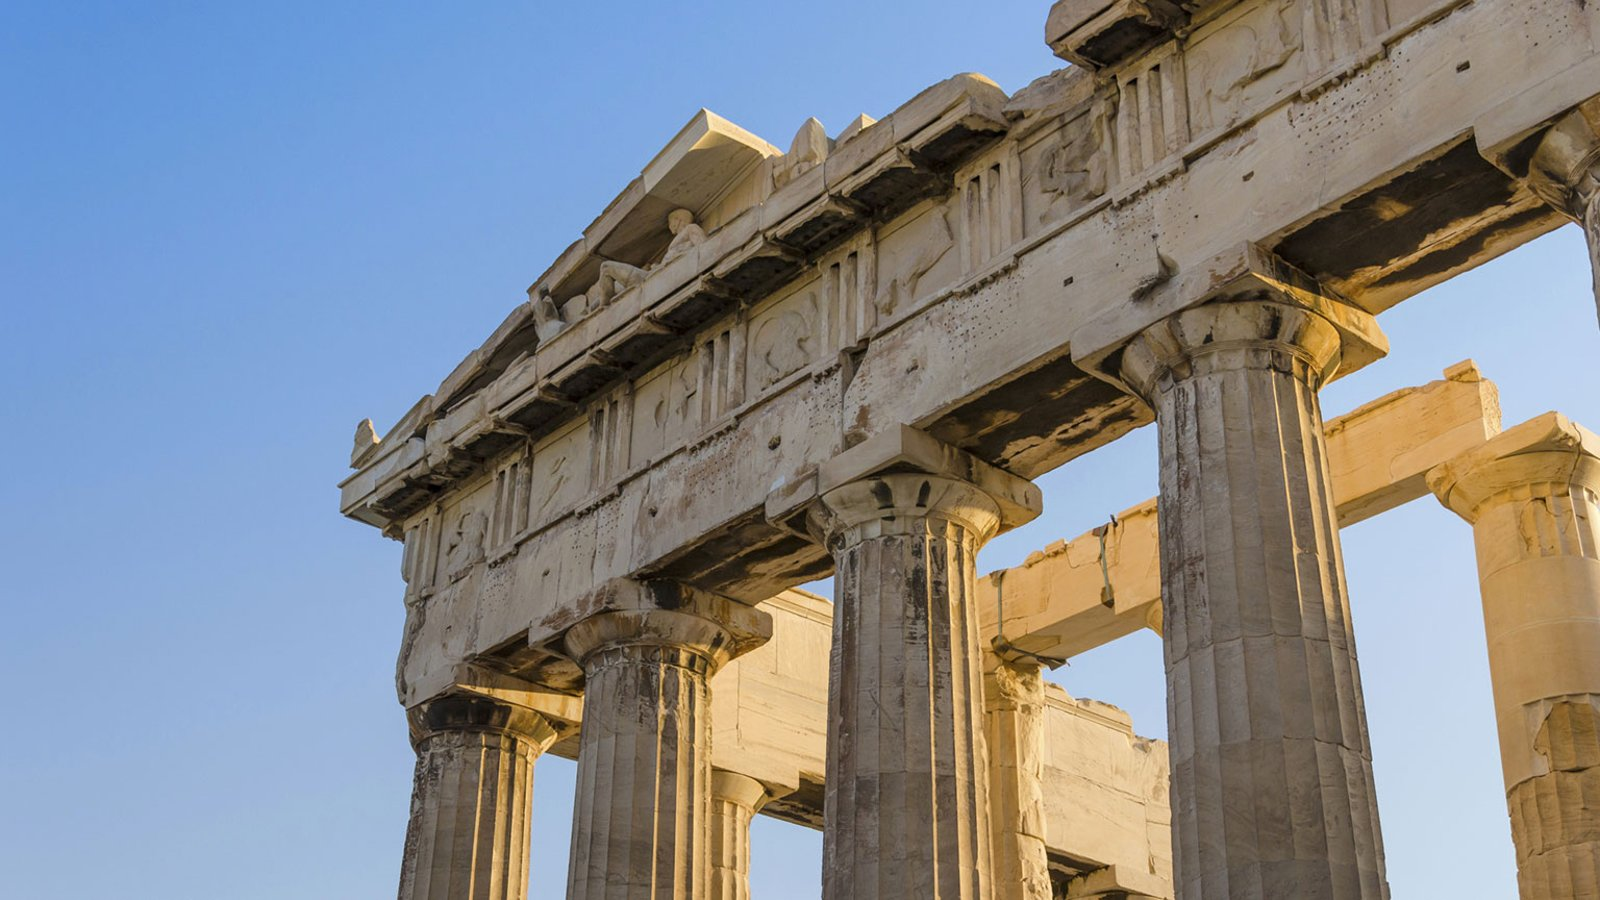 Stone Masonry Perfected—The Greek Temple